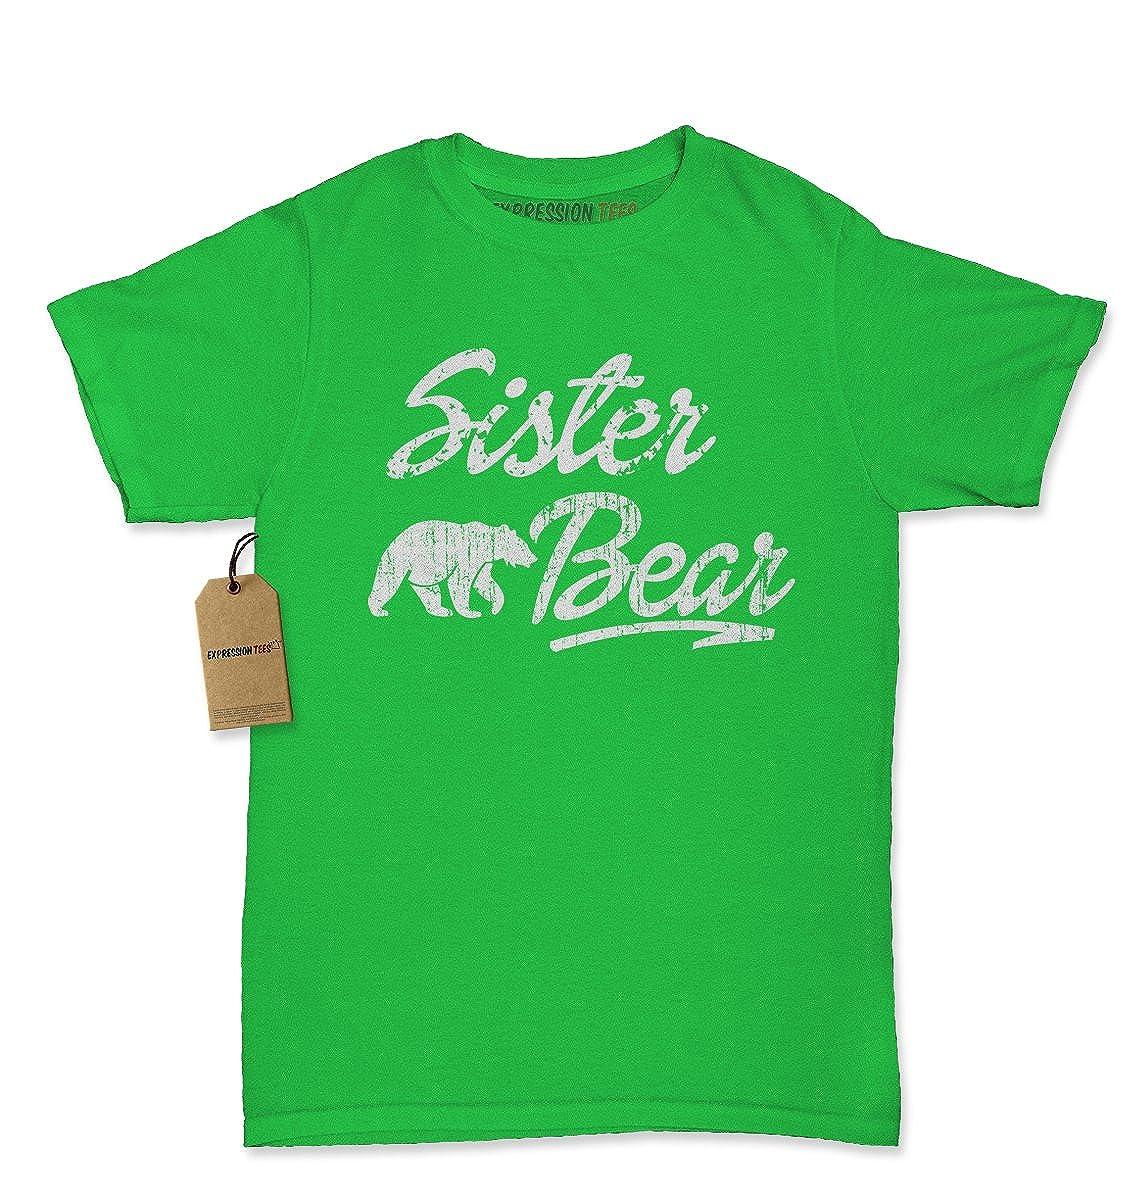 Expression Tees Sister Bear Cub Family Womens T-shirt 1685-W